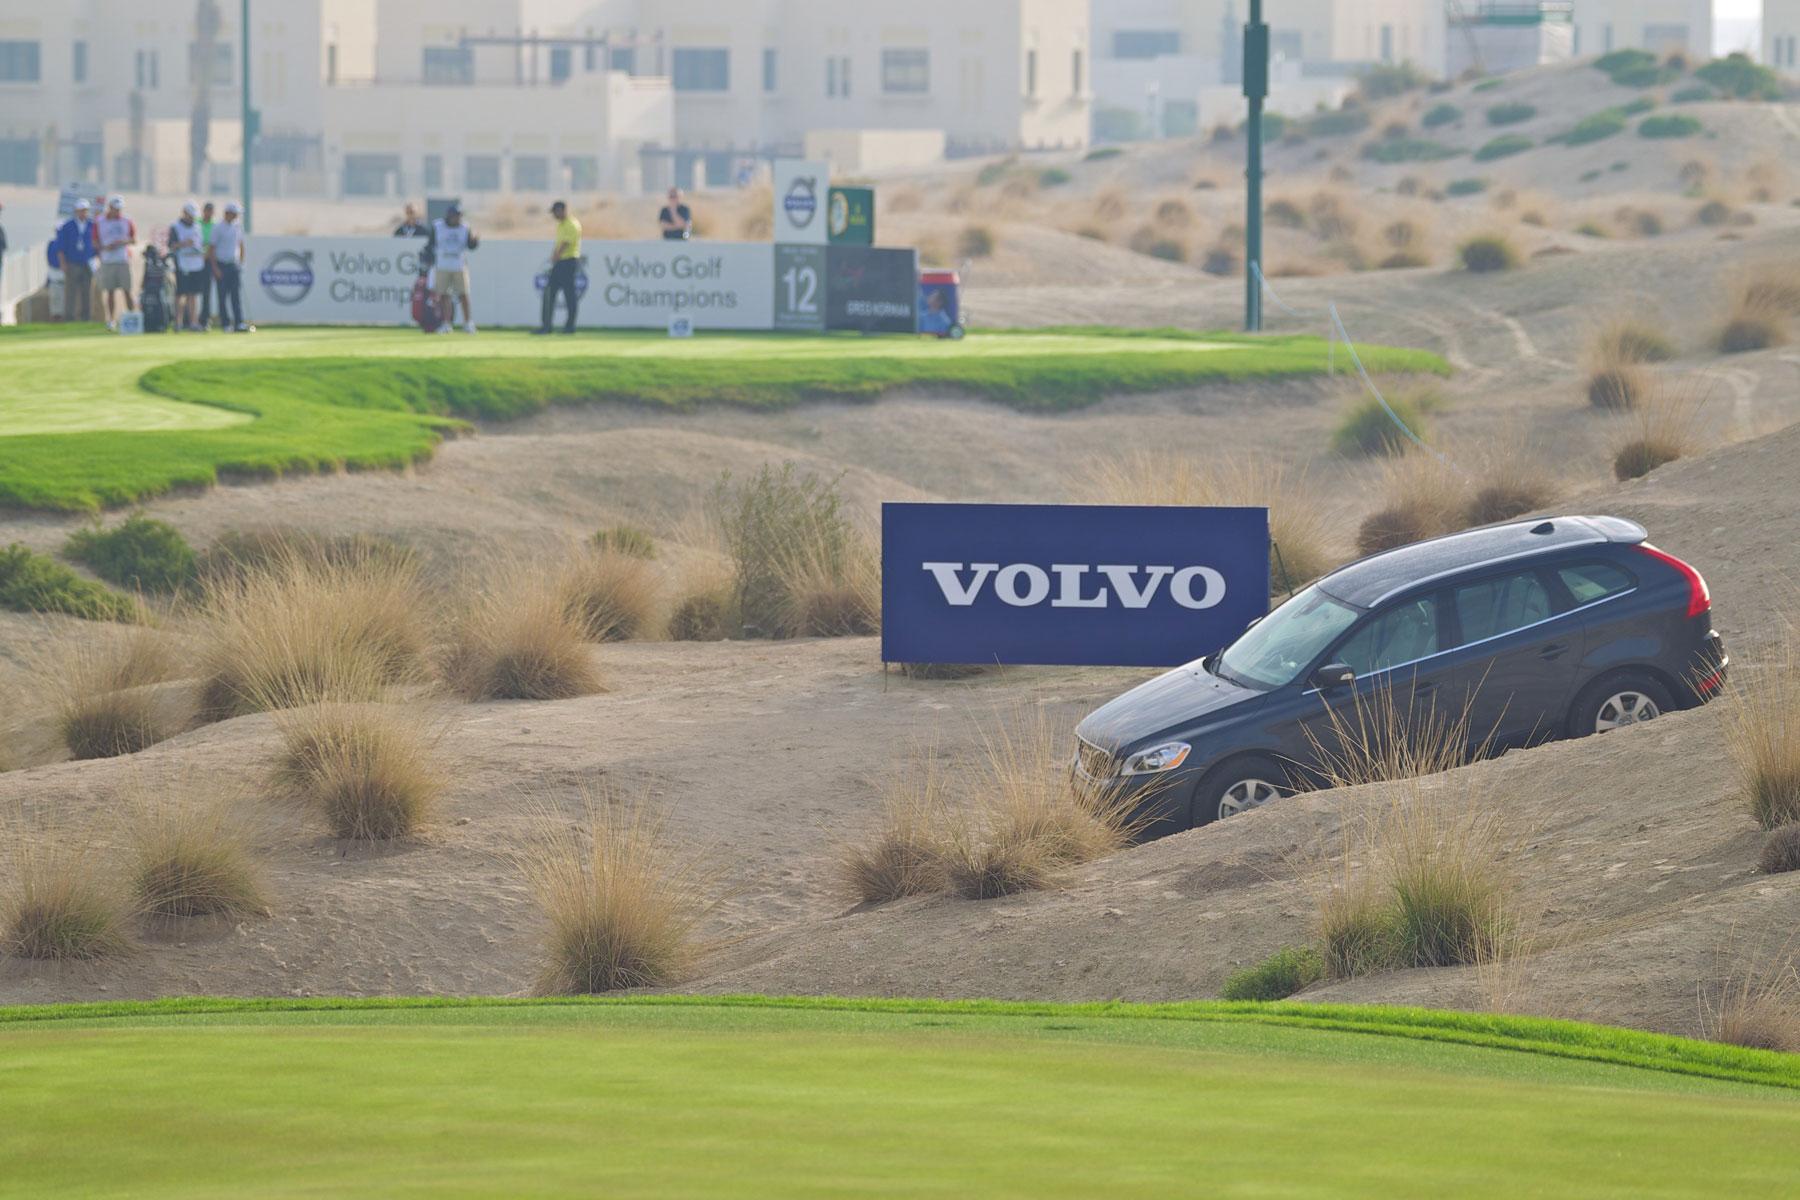 Volvo Golf Championships 2011